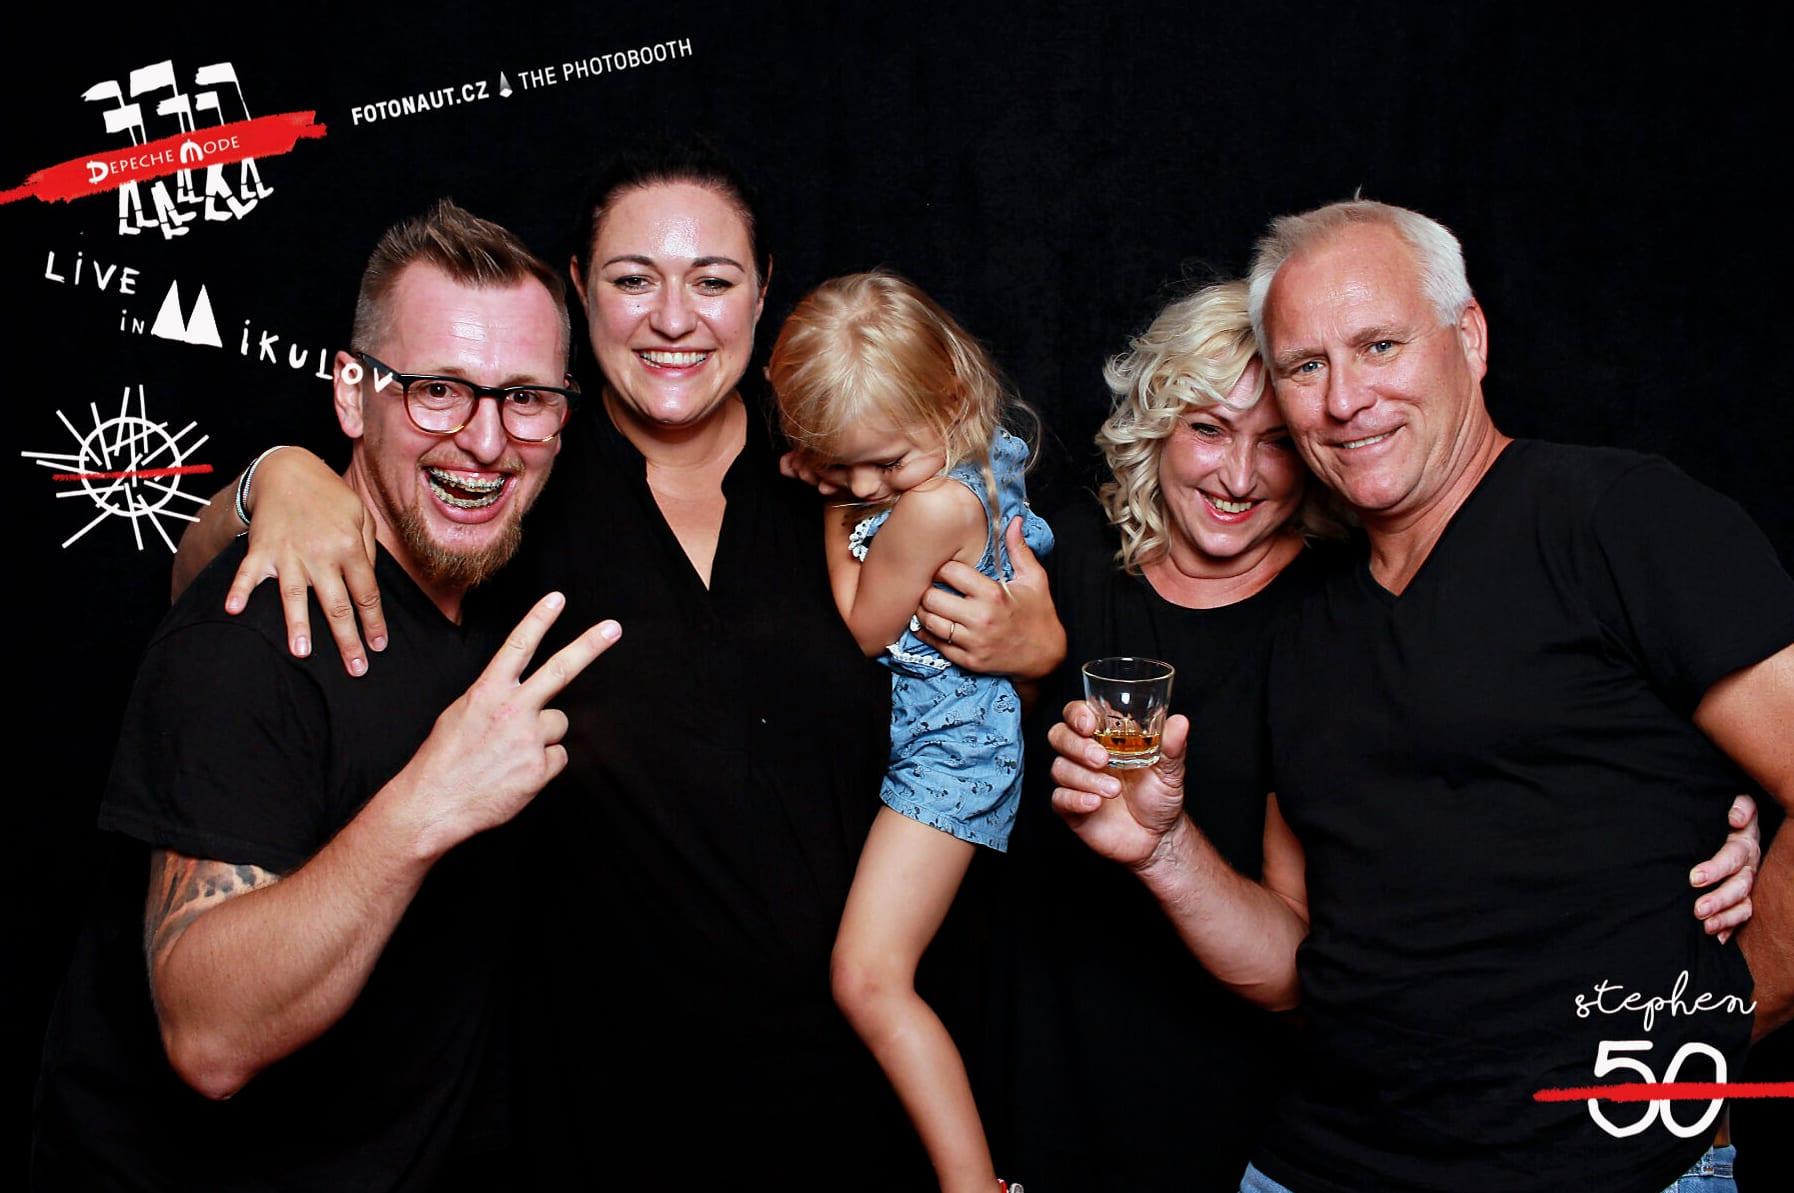 fotokoutek-brno-oslava-stephen-50-31-8-2019-645758